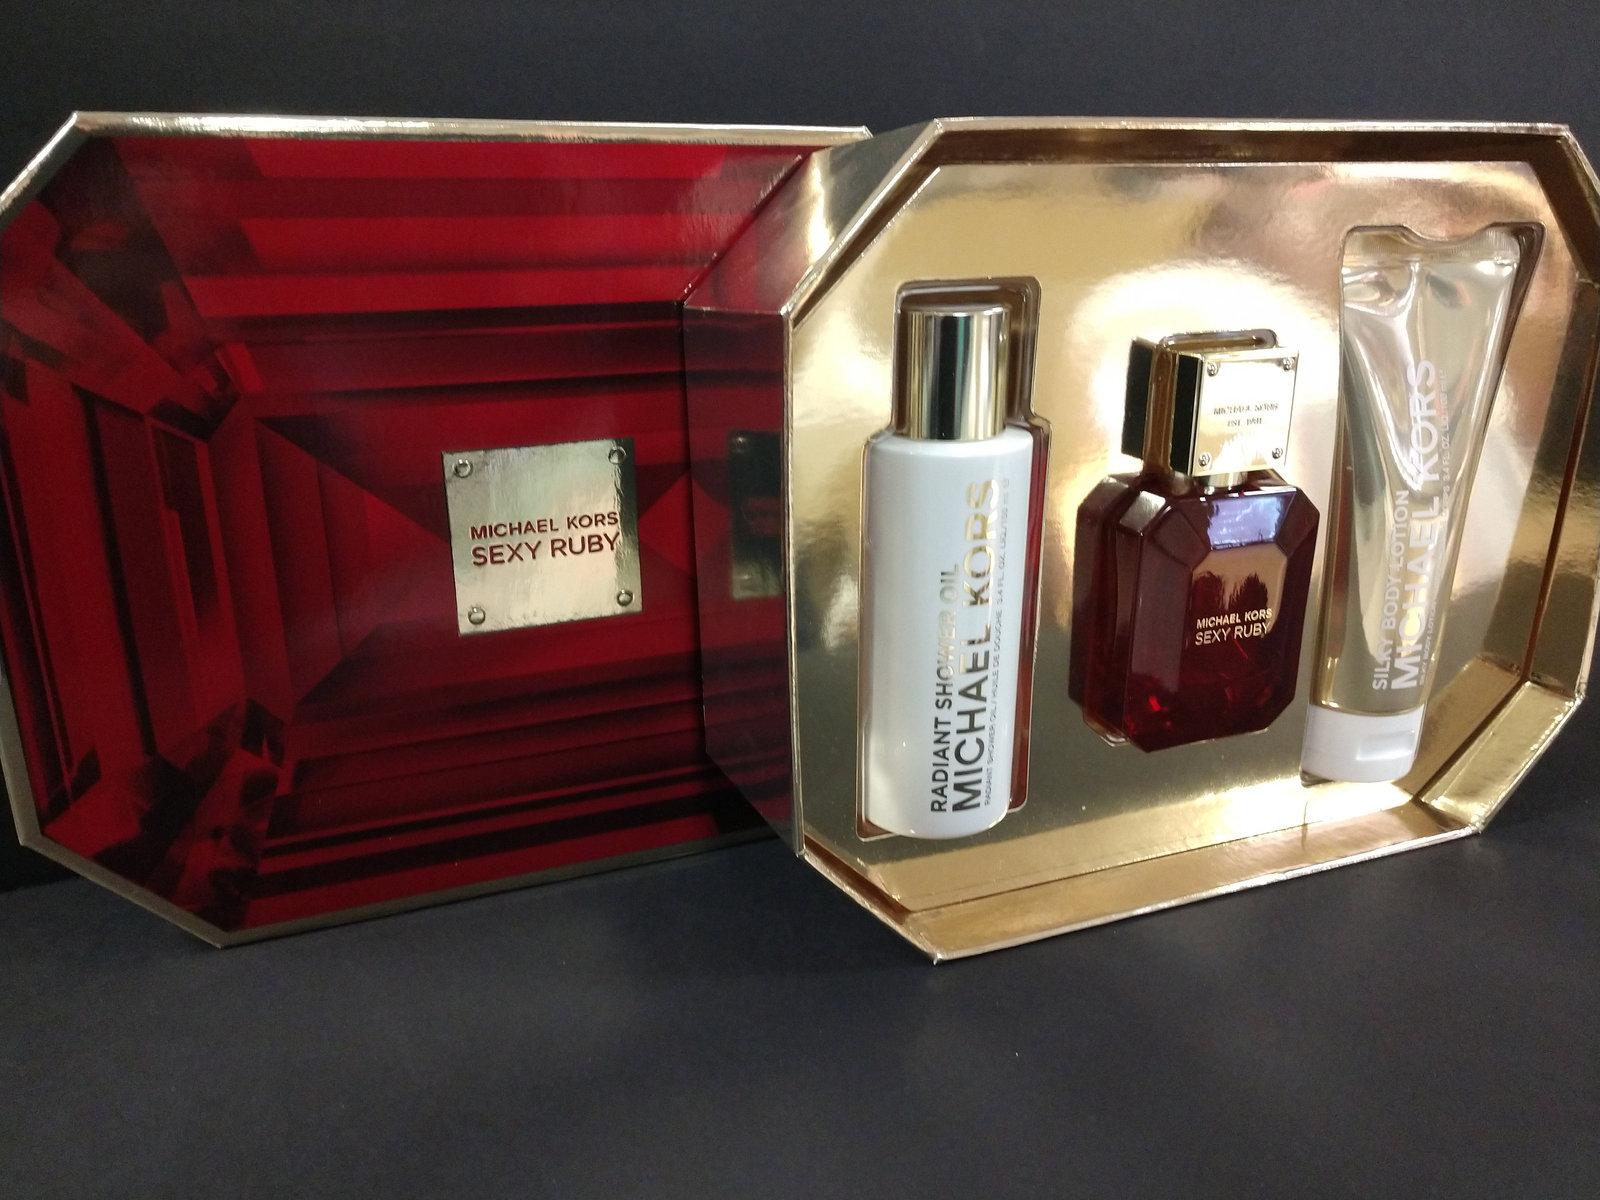 Michael Michael Kors Sexy Ruby Eau De Parfum 3 Piece Gift Set For Women